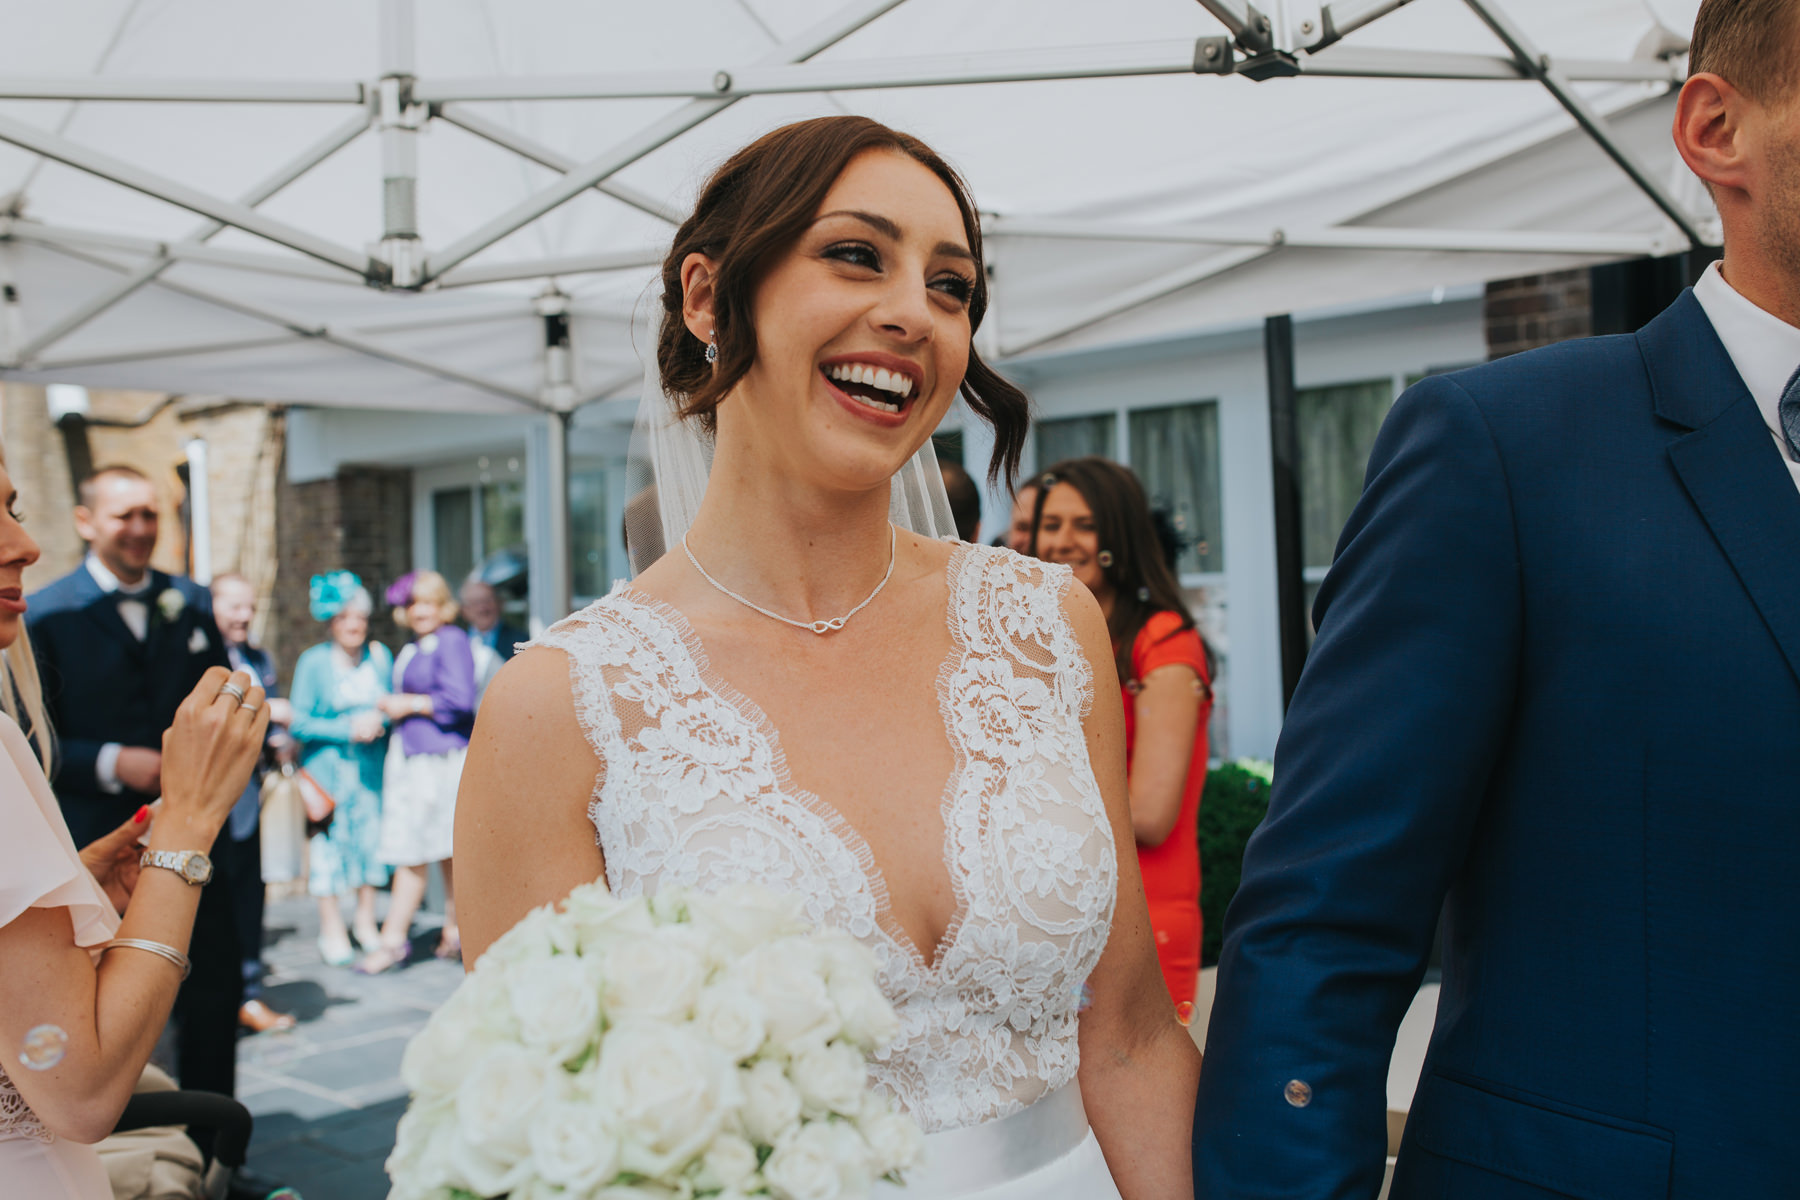 CRL-227-The Bingham Wedding Richmond-groom bride guests blowing bubbles.jpg